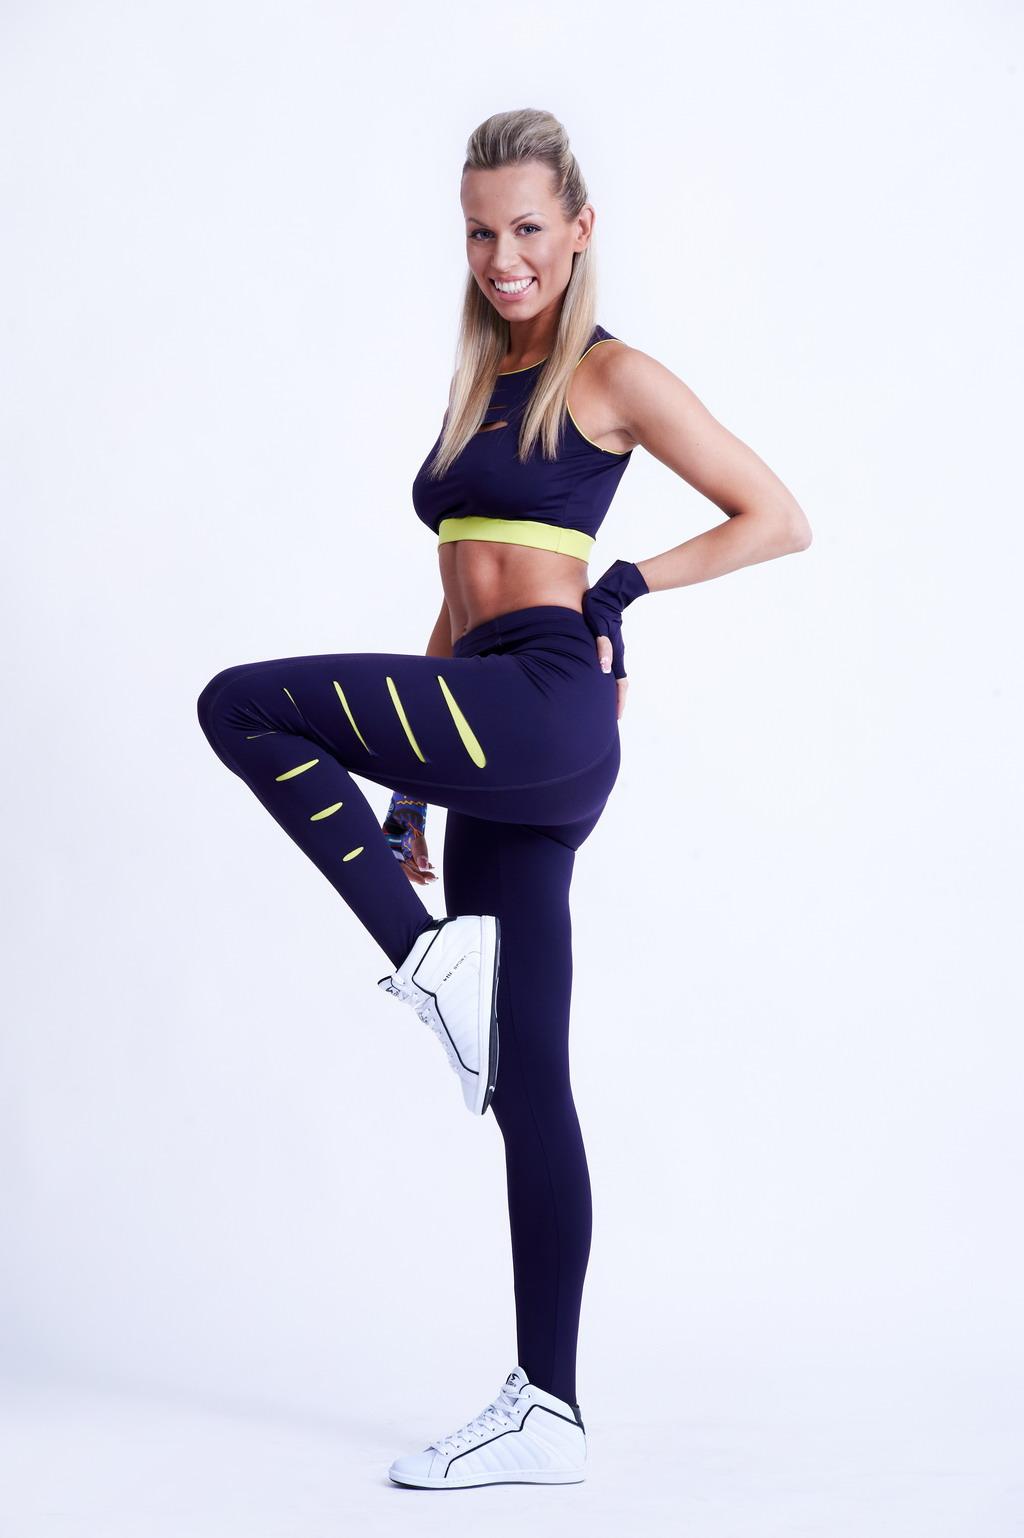 Костюм для фитнеса (61 фото)  фитнес в специальном костюме с ... 5dfb8cd5f99